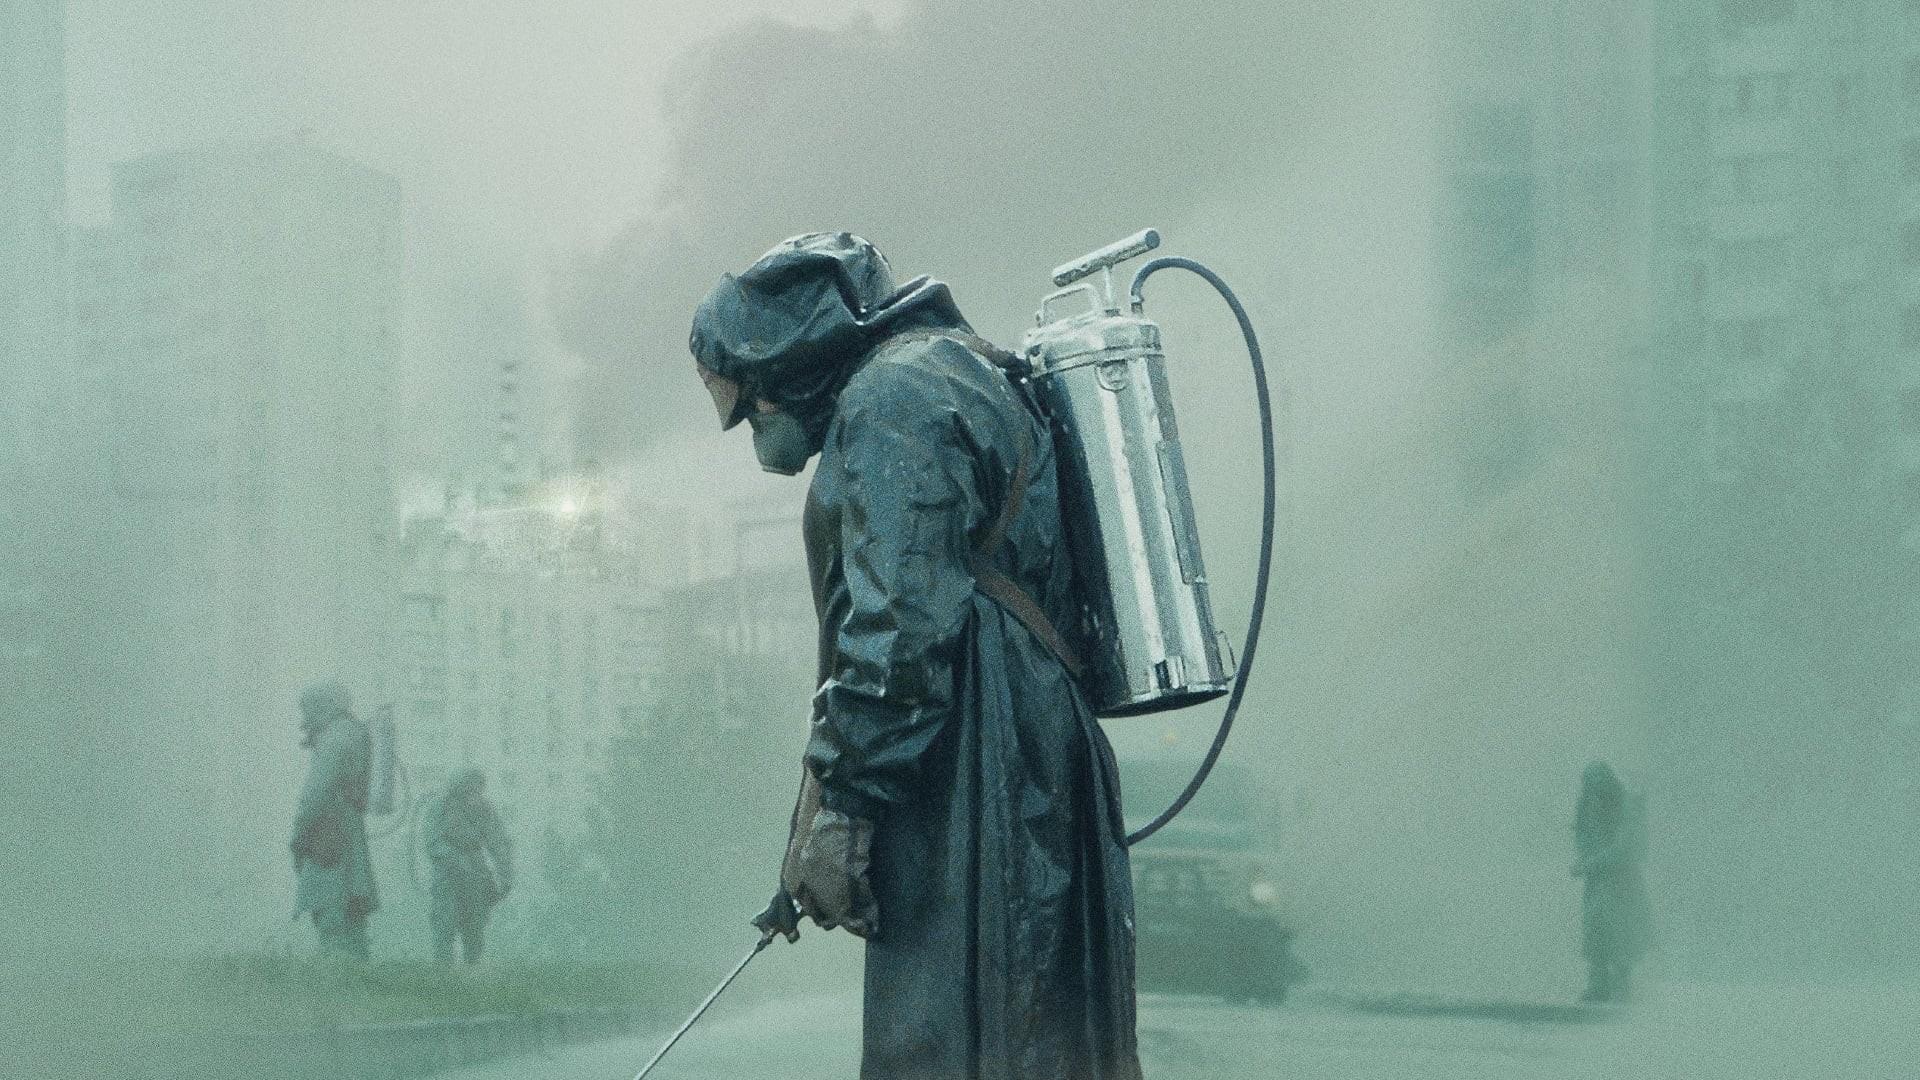 Veredito de Chernobyl